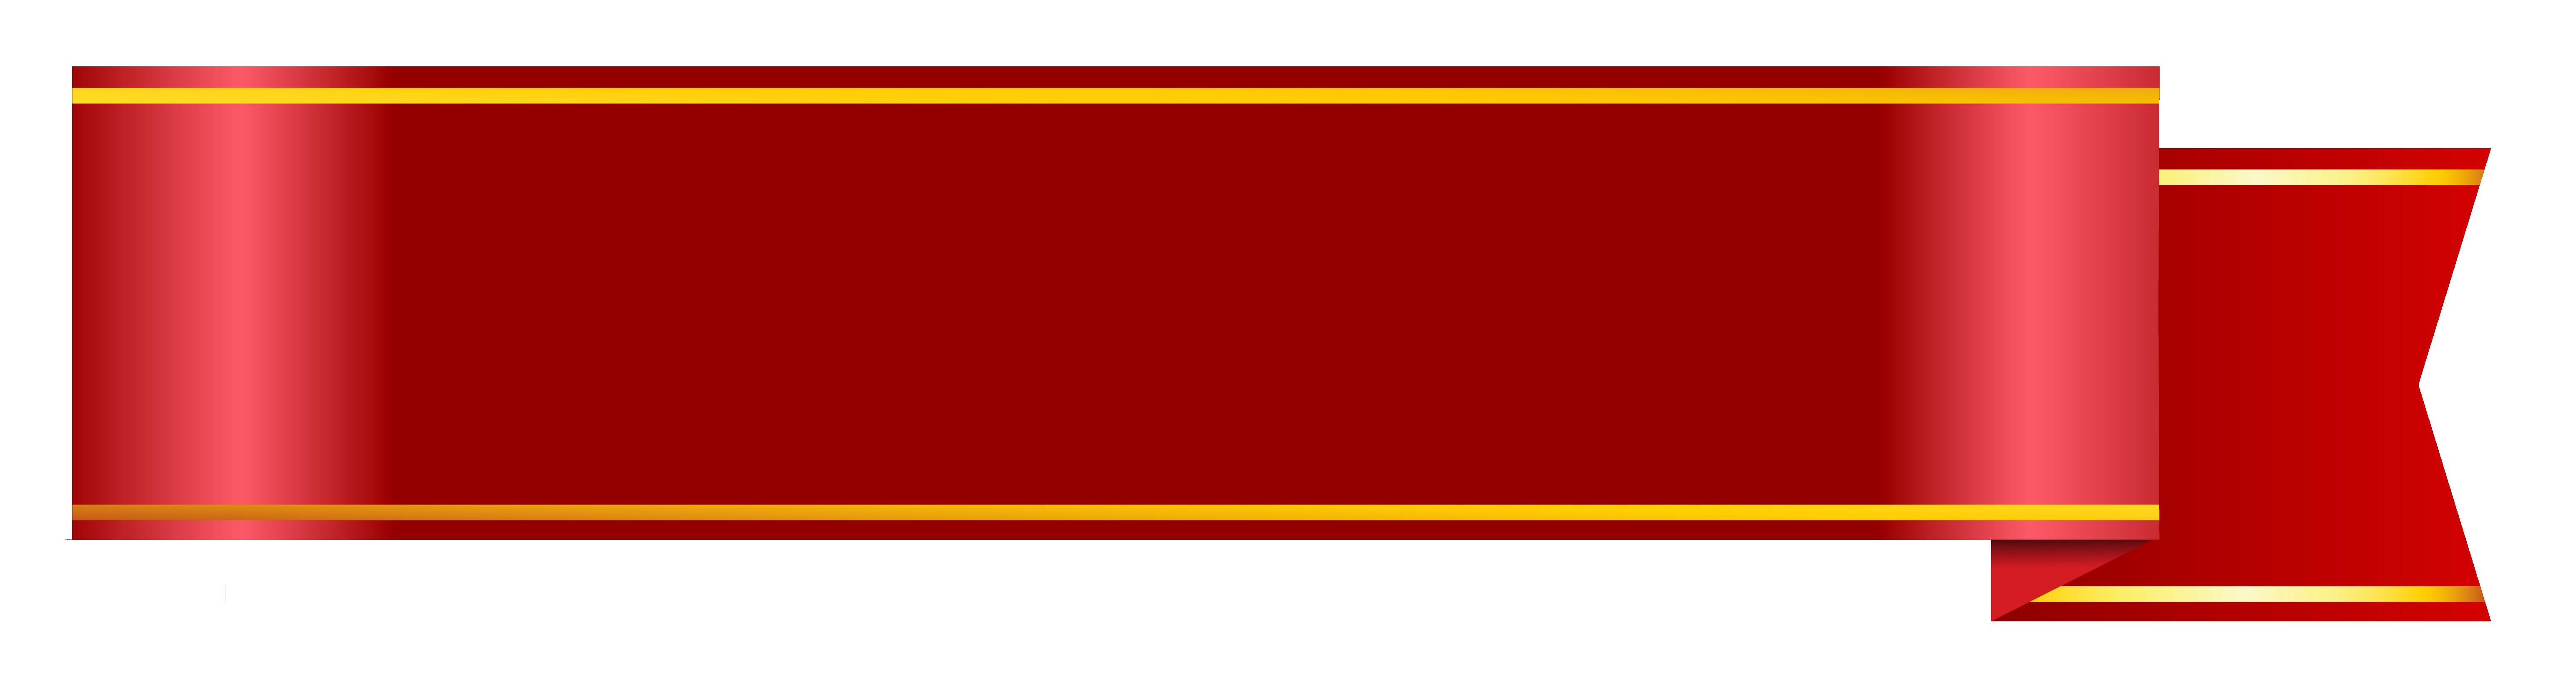 Red Ribbon Banner Transparent Background.